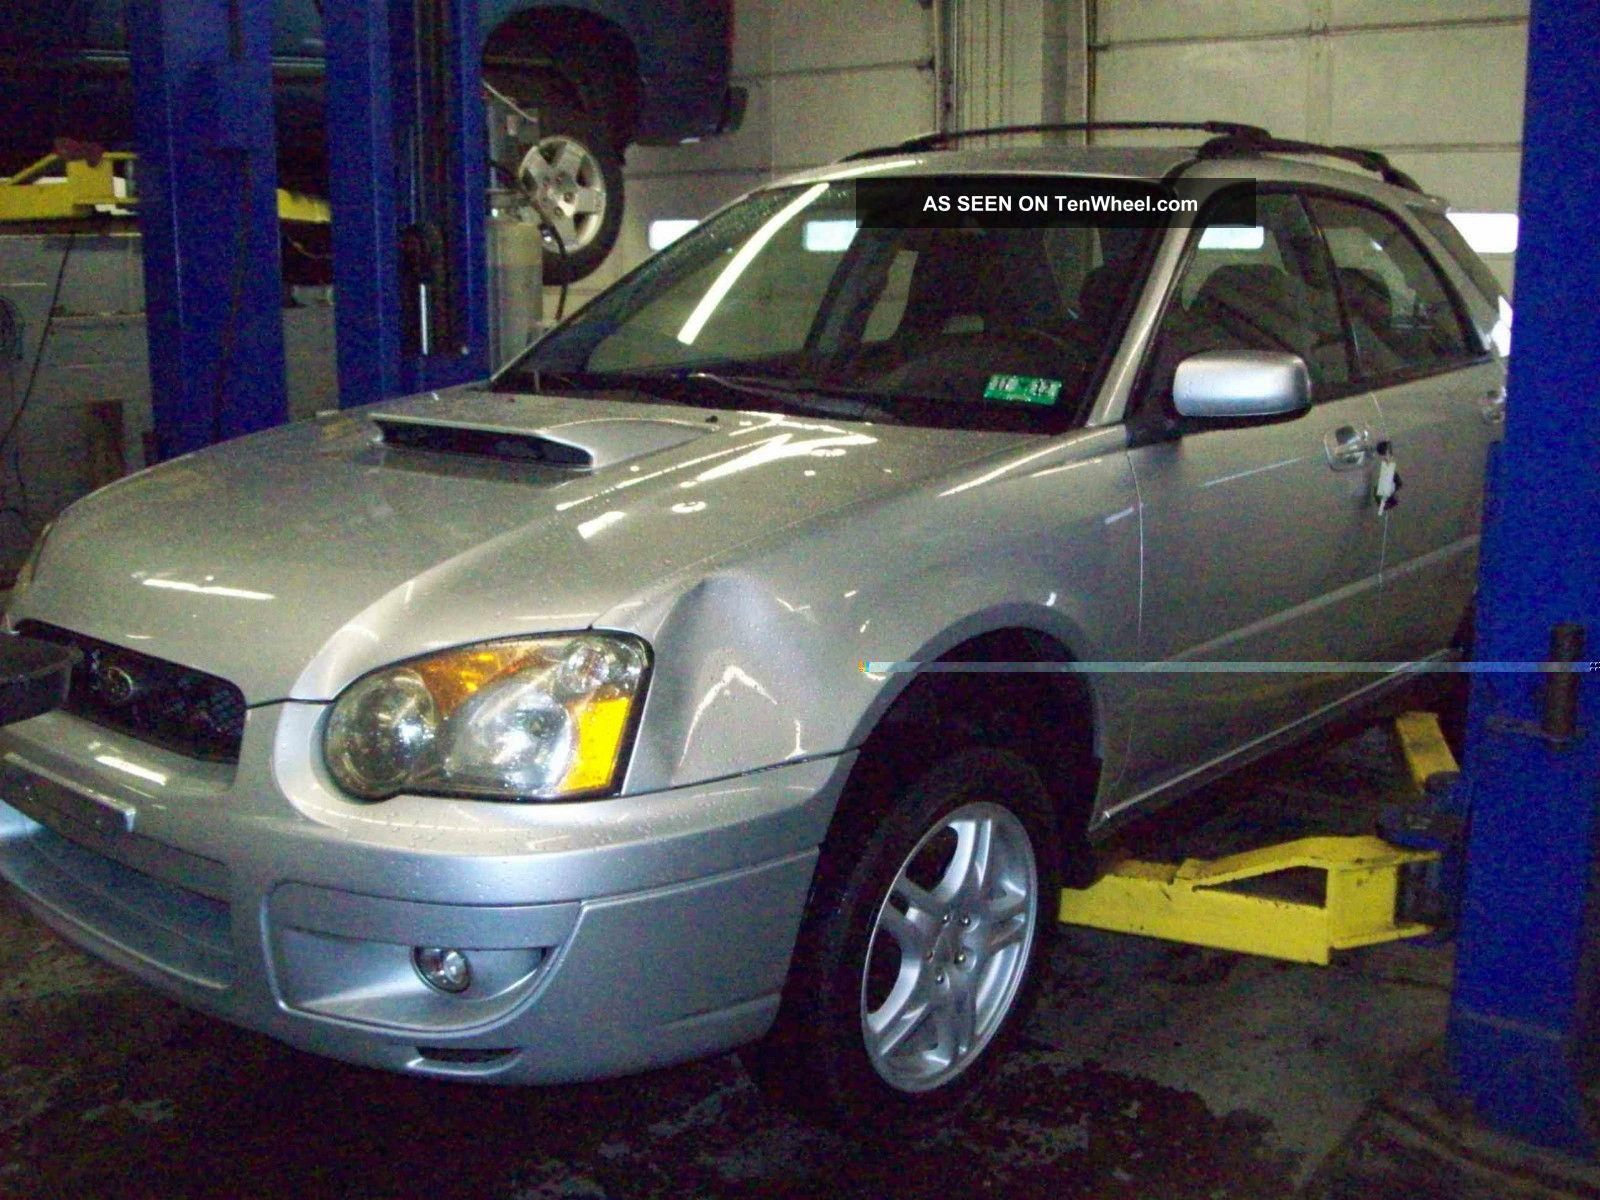 2004 subaru impreza wrx all wheel drive turbo 5 speed manual 2003 VW Bug Replacing Climate Control Backlight 2004 Beetle